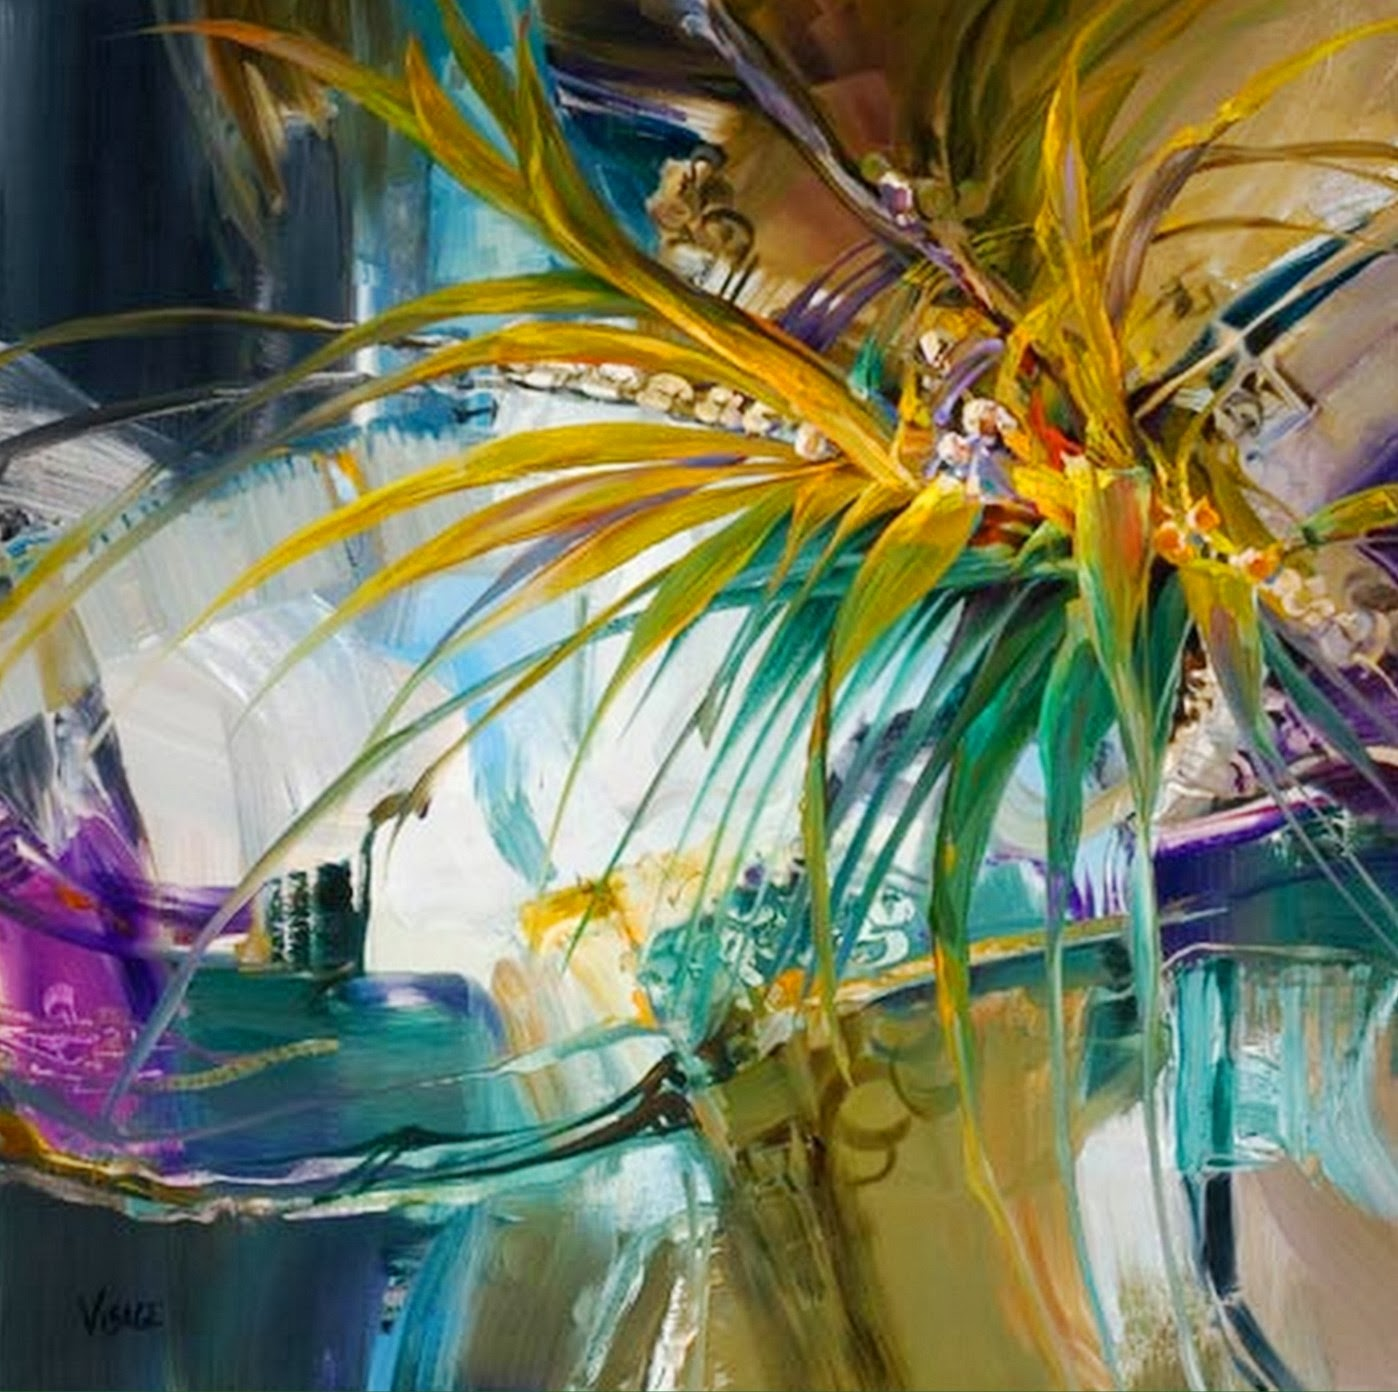 Pintura moderna y fotograf a art stica pintura abstracta for Imagenes cuadros abstractos modernos